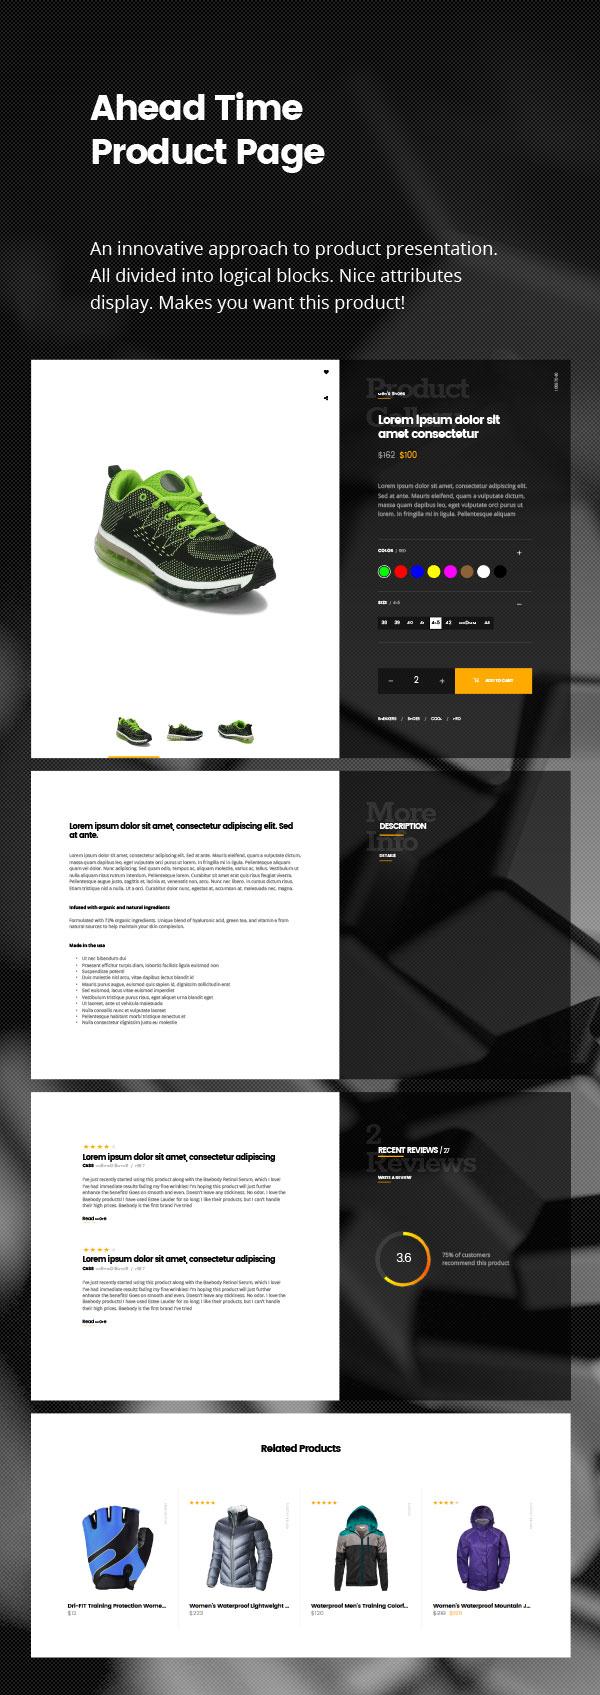 joli-sport - Product Page